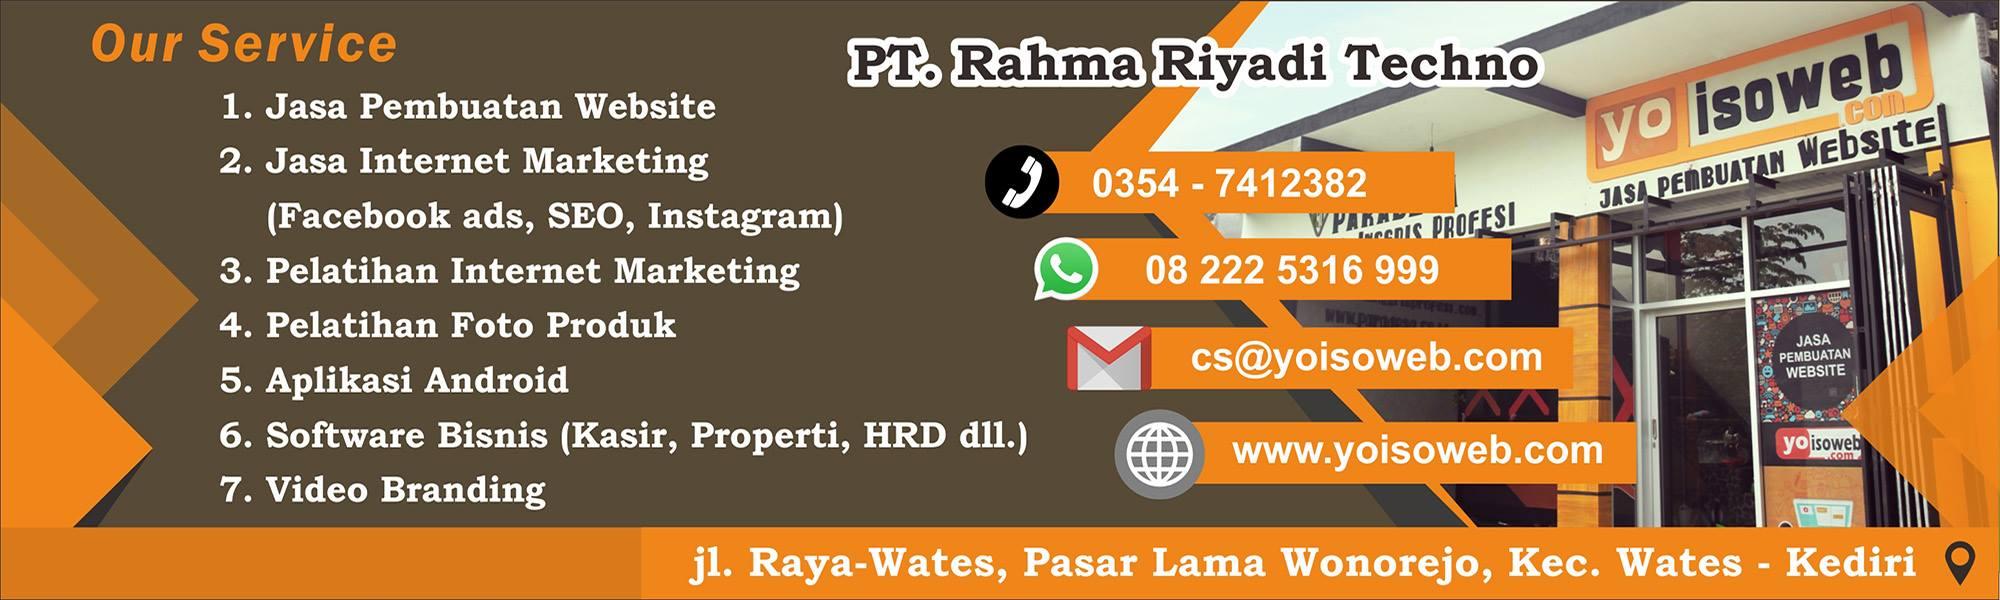 Jasa website sales mobil Ngawi 08 222 5316 999